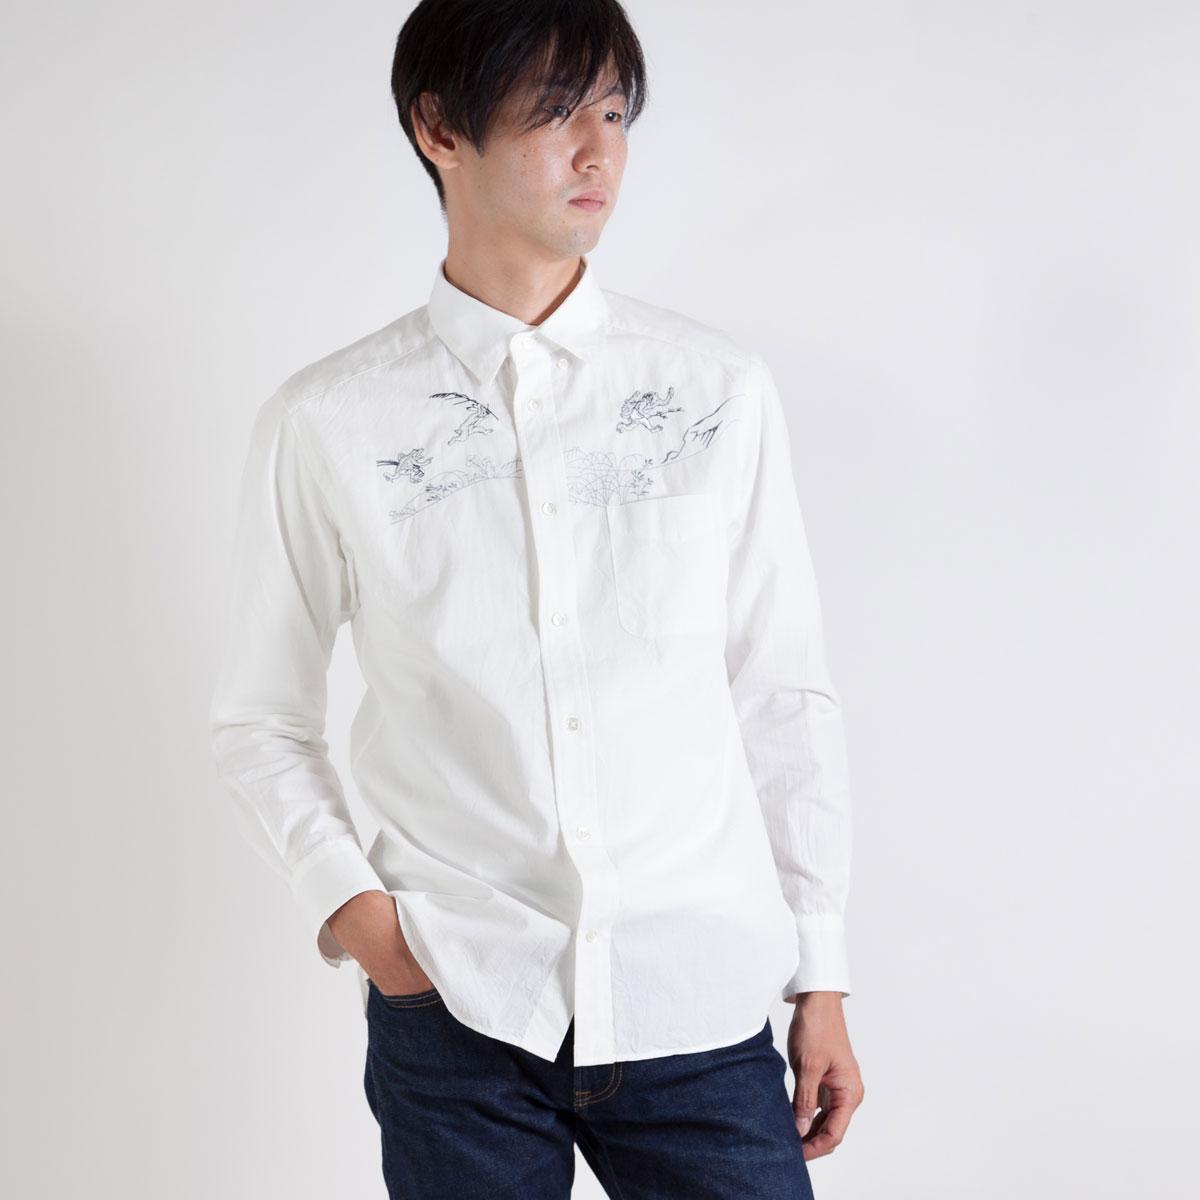 KY17-675M/メンズシャツ[播州織]/追われる猿